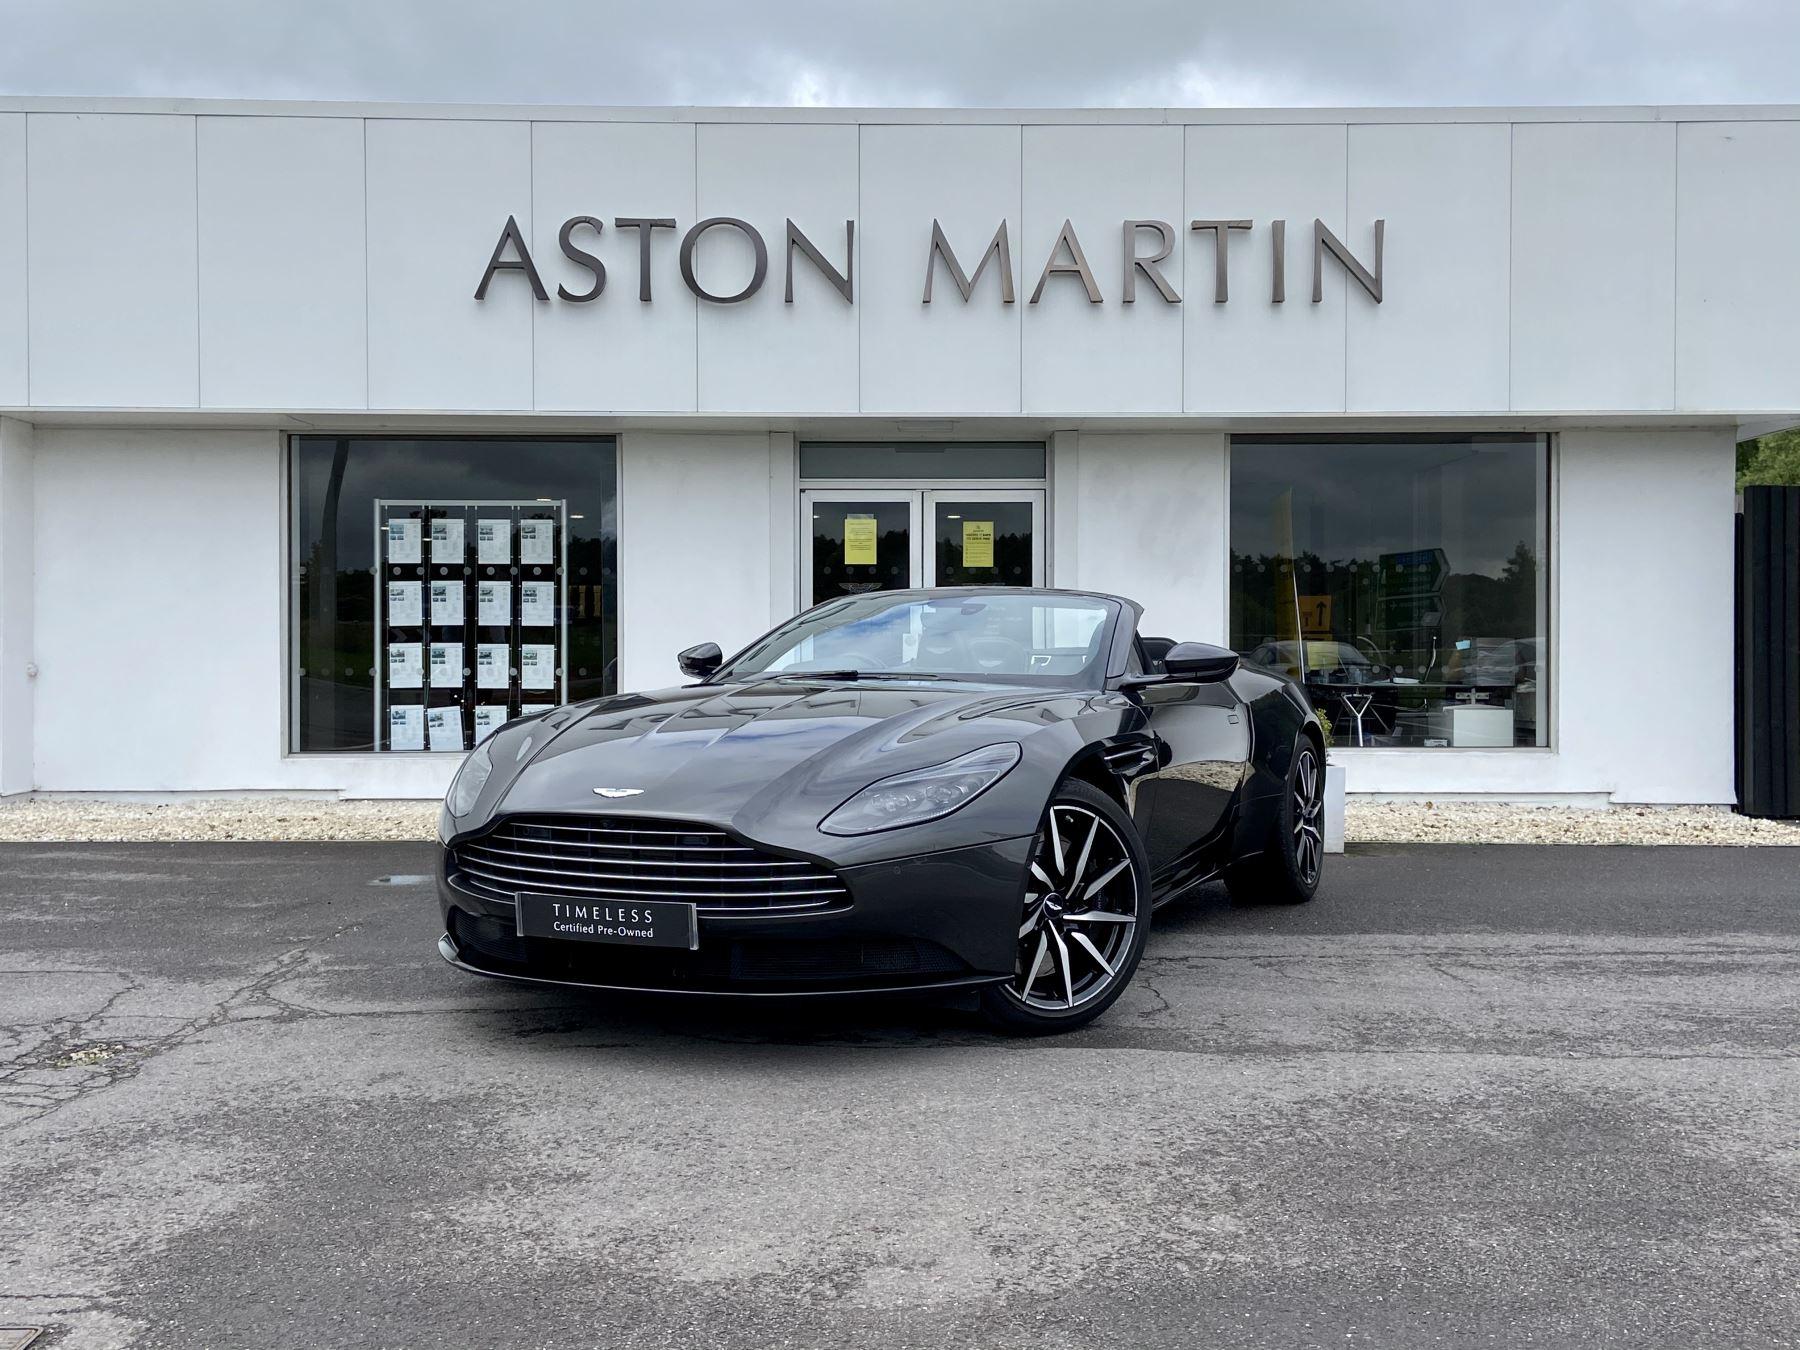 Aston Martin DB11 V8 Volante 2dr Touchtronic 4.0 Automatic Convertible (2018)